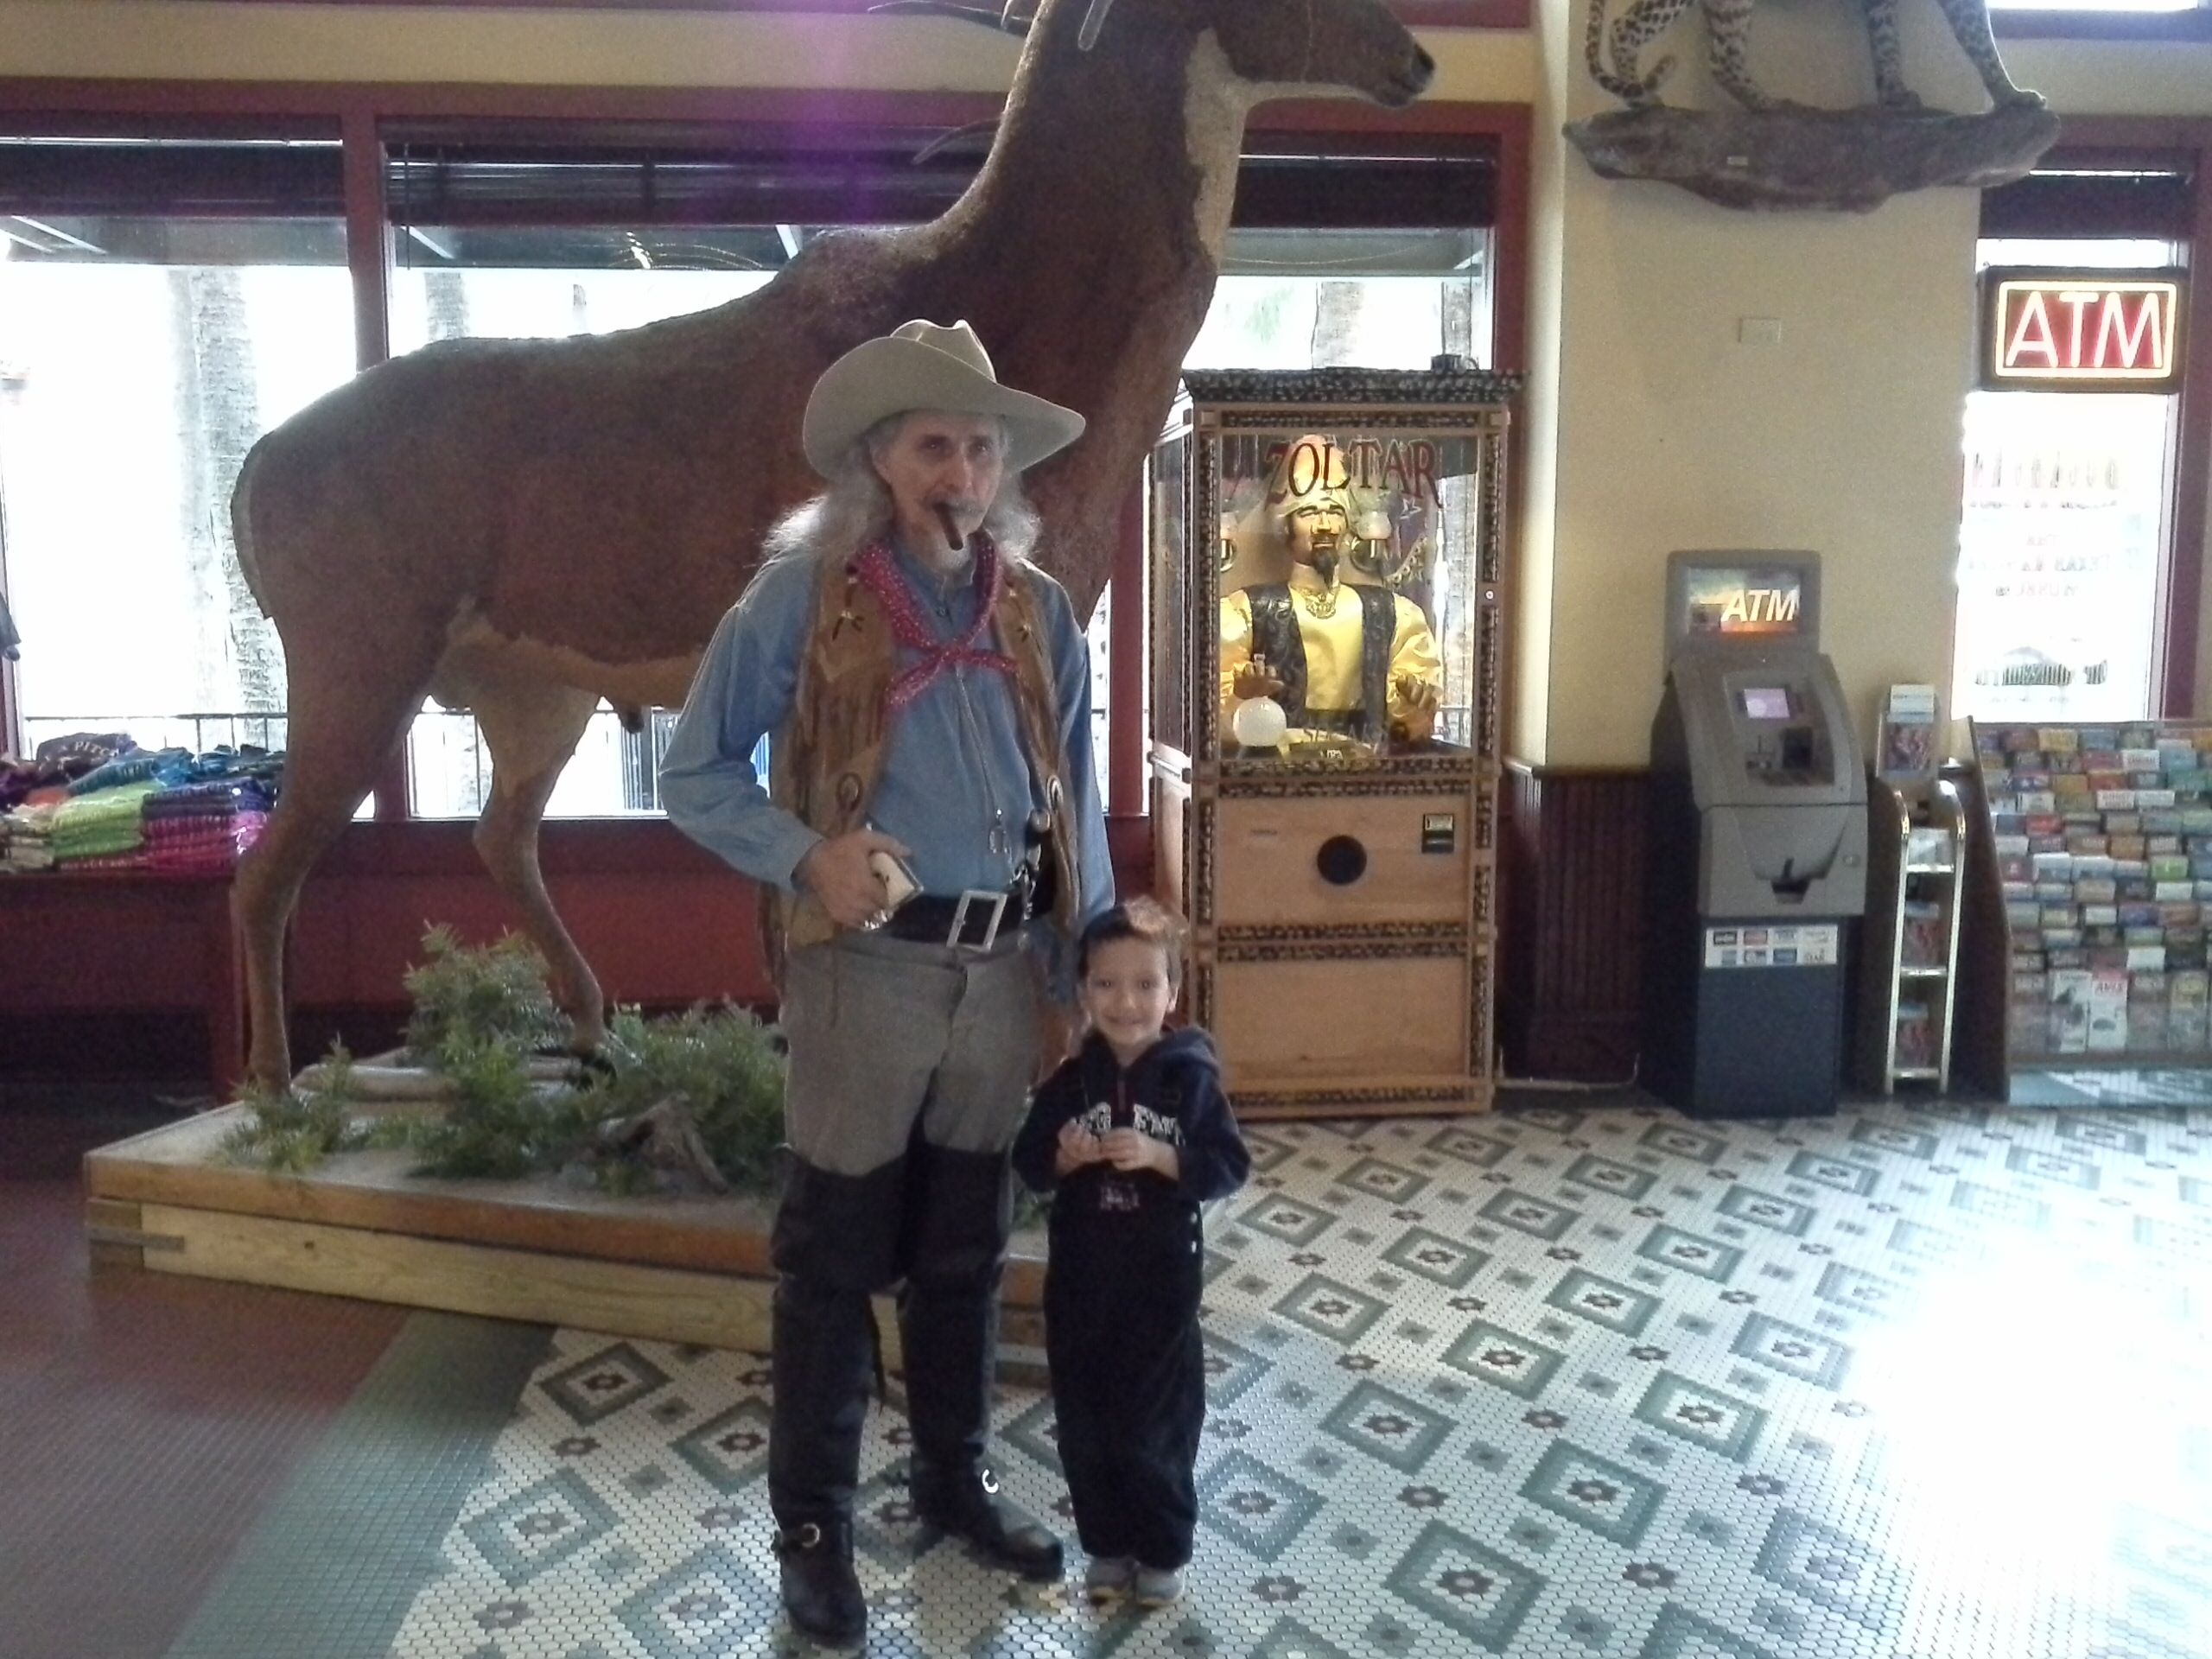 Teddy at the Texas Ranger Museum in San Antonio #familytravel